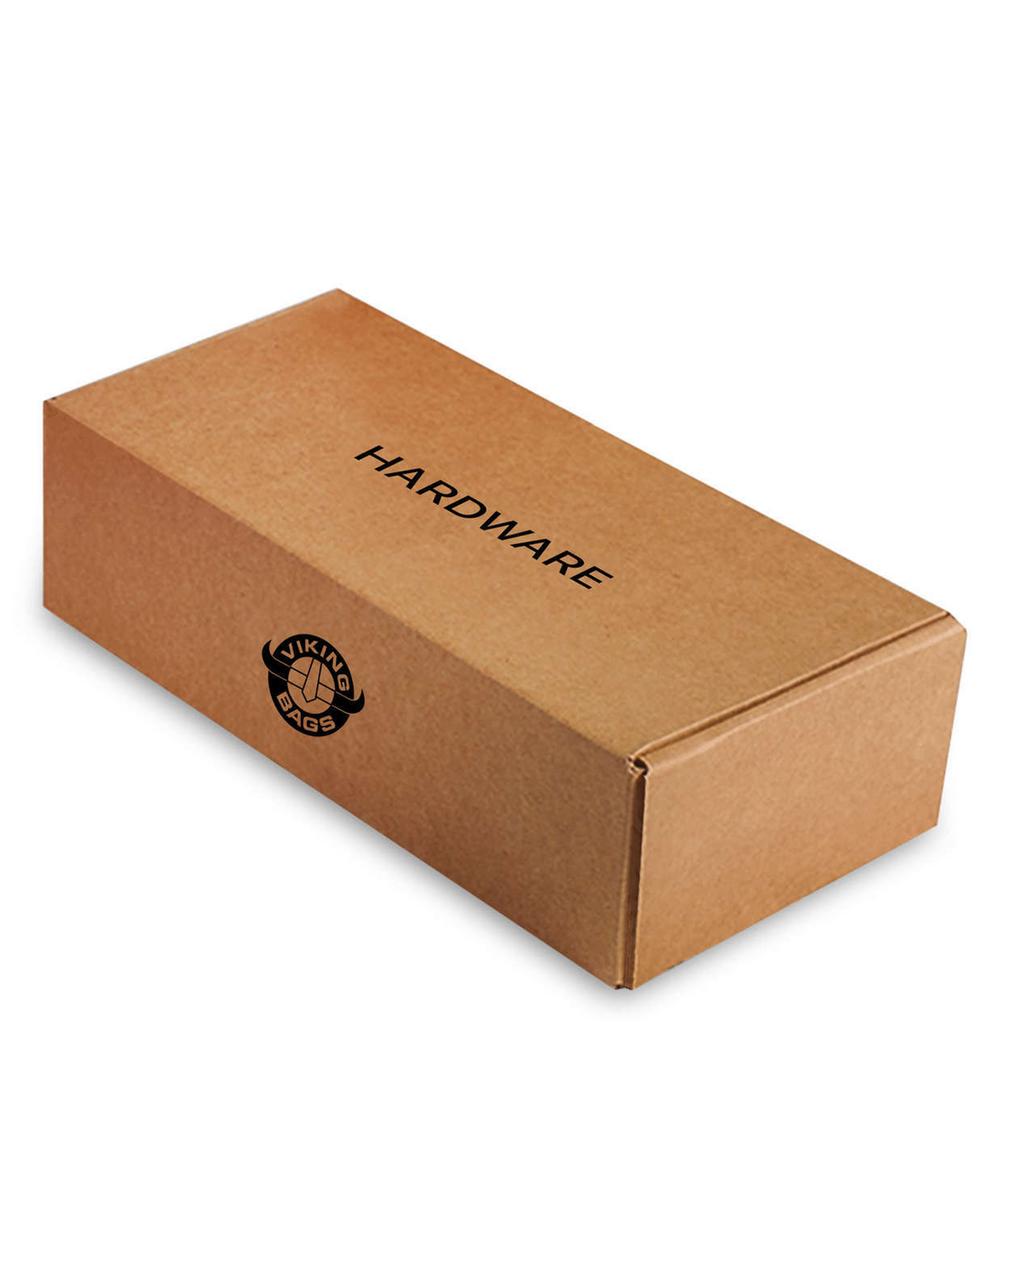 Honda 1500 Valkyrie Interstate Hammer Series Extra Large Motorcycle Saddlebags Hardware Box